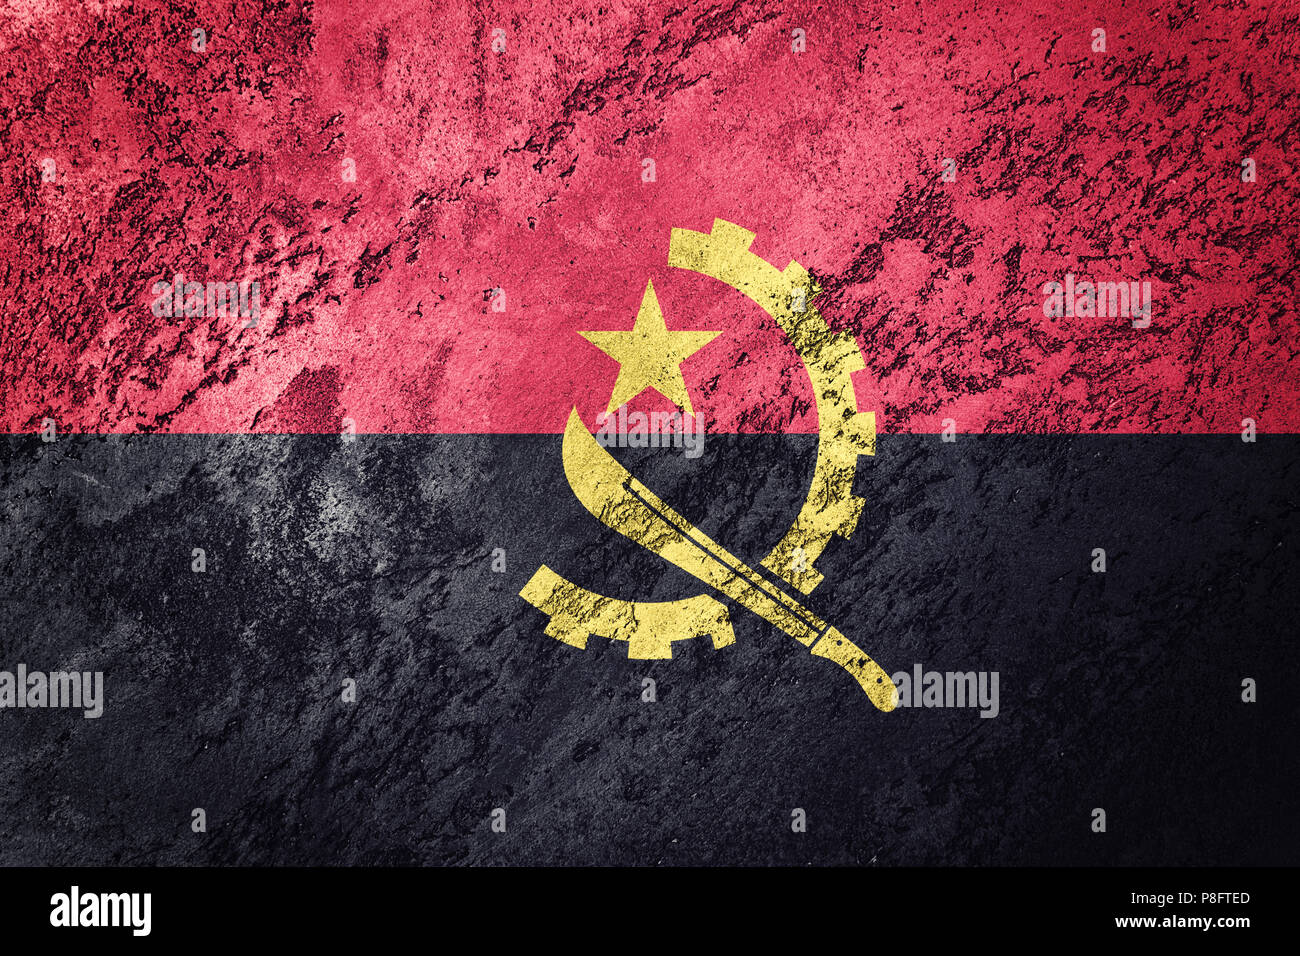 Grunge Angola flag. Angola flag with grunge texture. - Stock Image